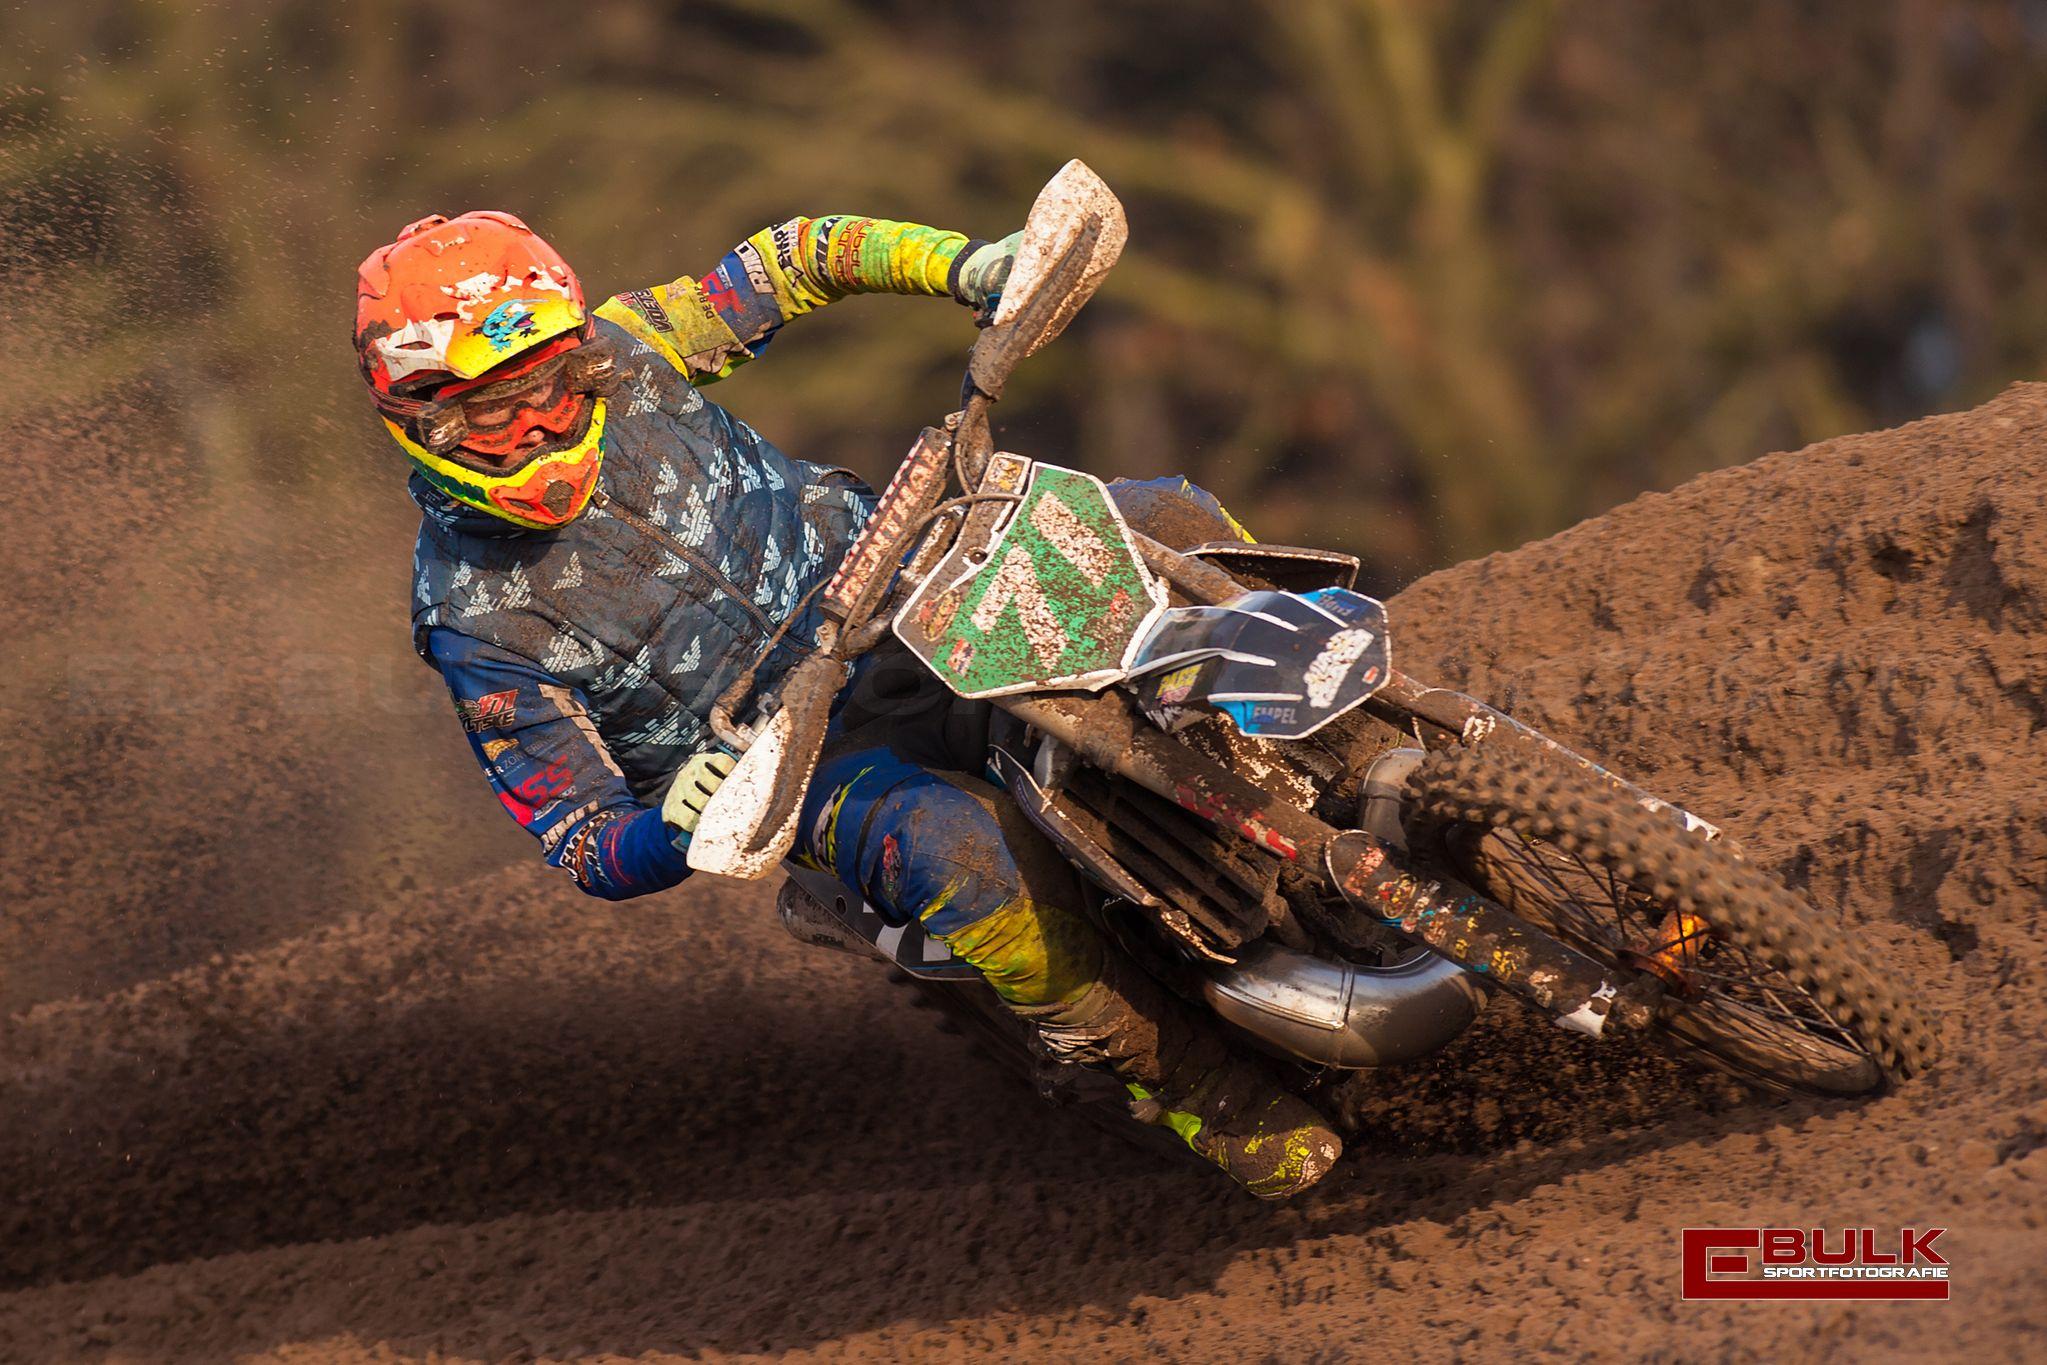 ebs_1805-ed_bulk_sportfotografie